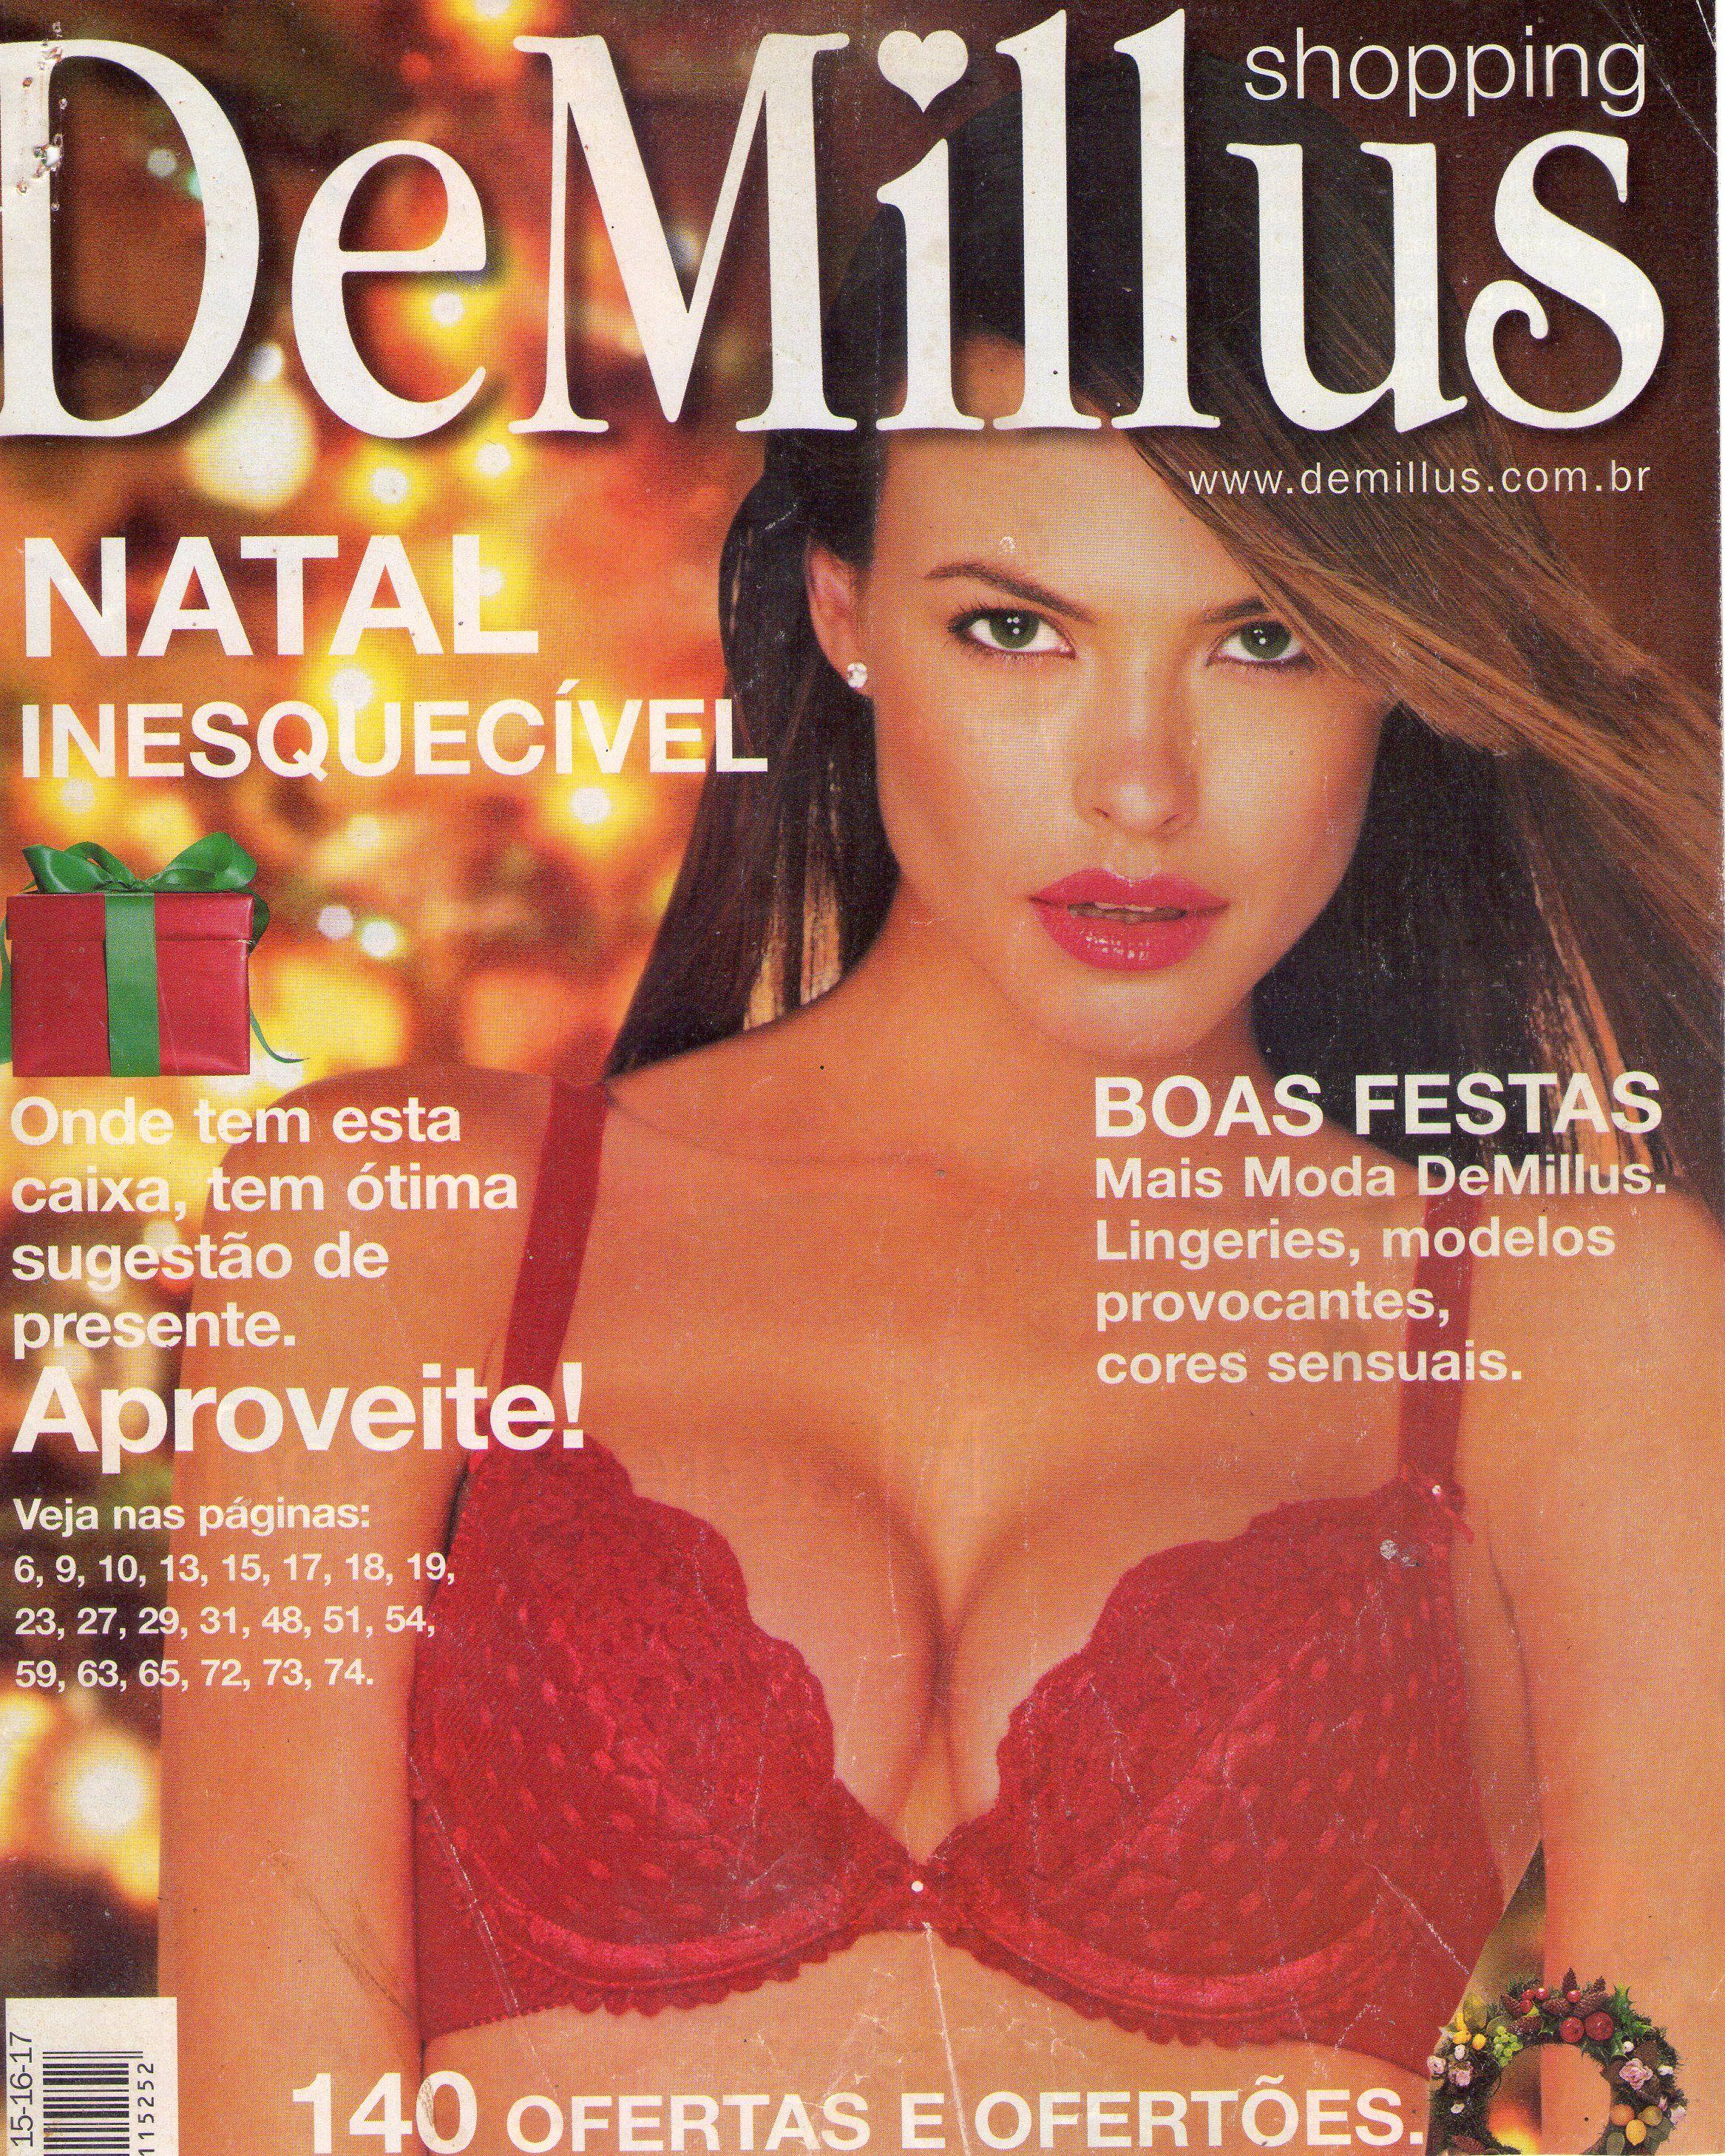 f291ad3e0 Revista Demillus Shopping 2002-C-15-16-17  Demillus